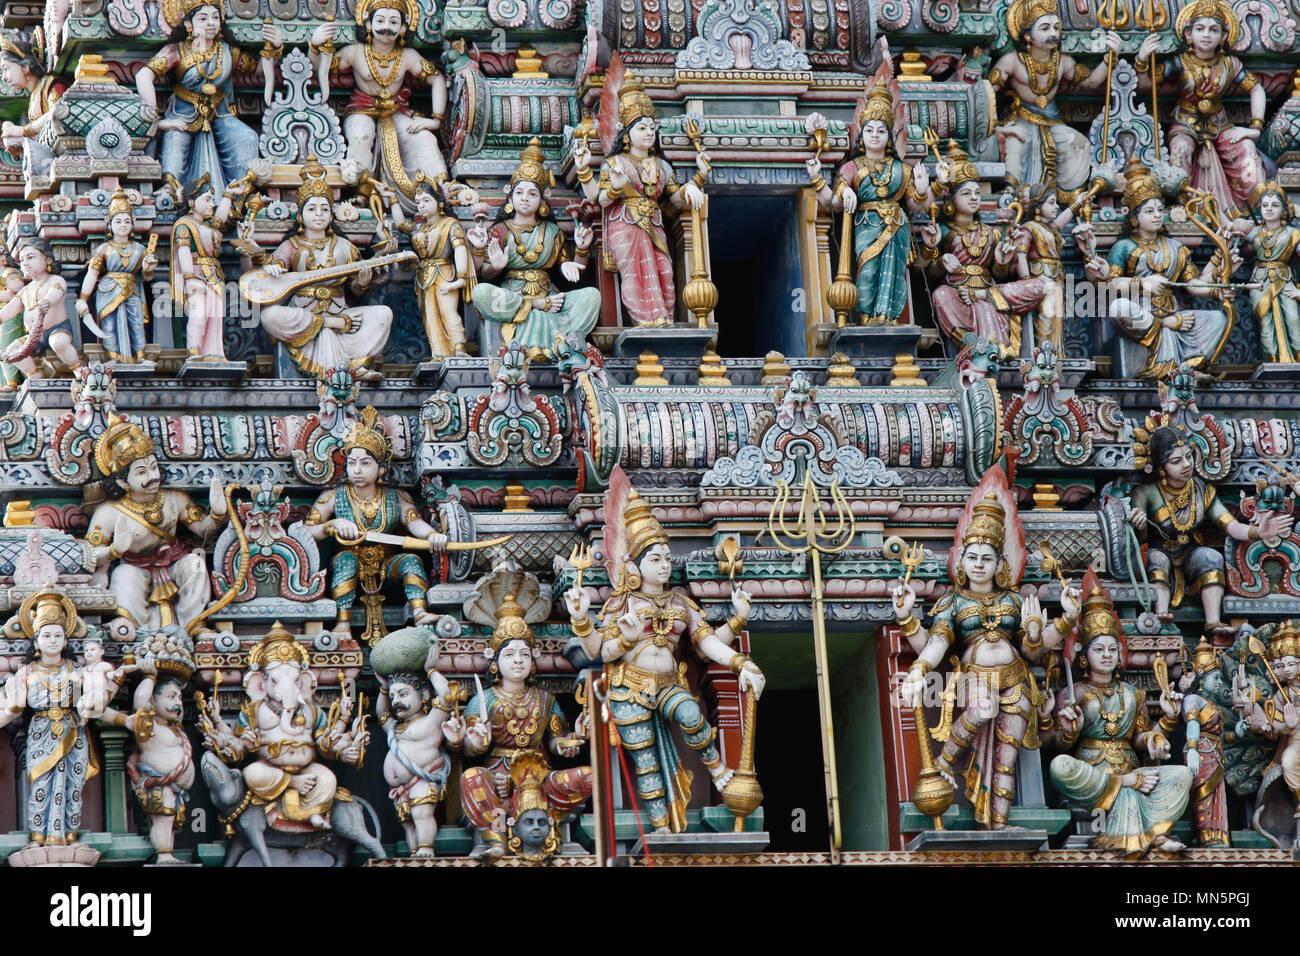 Hindu temple in Singapore - Stock Image